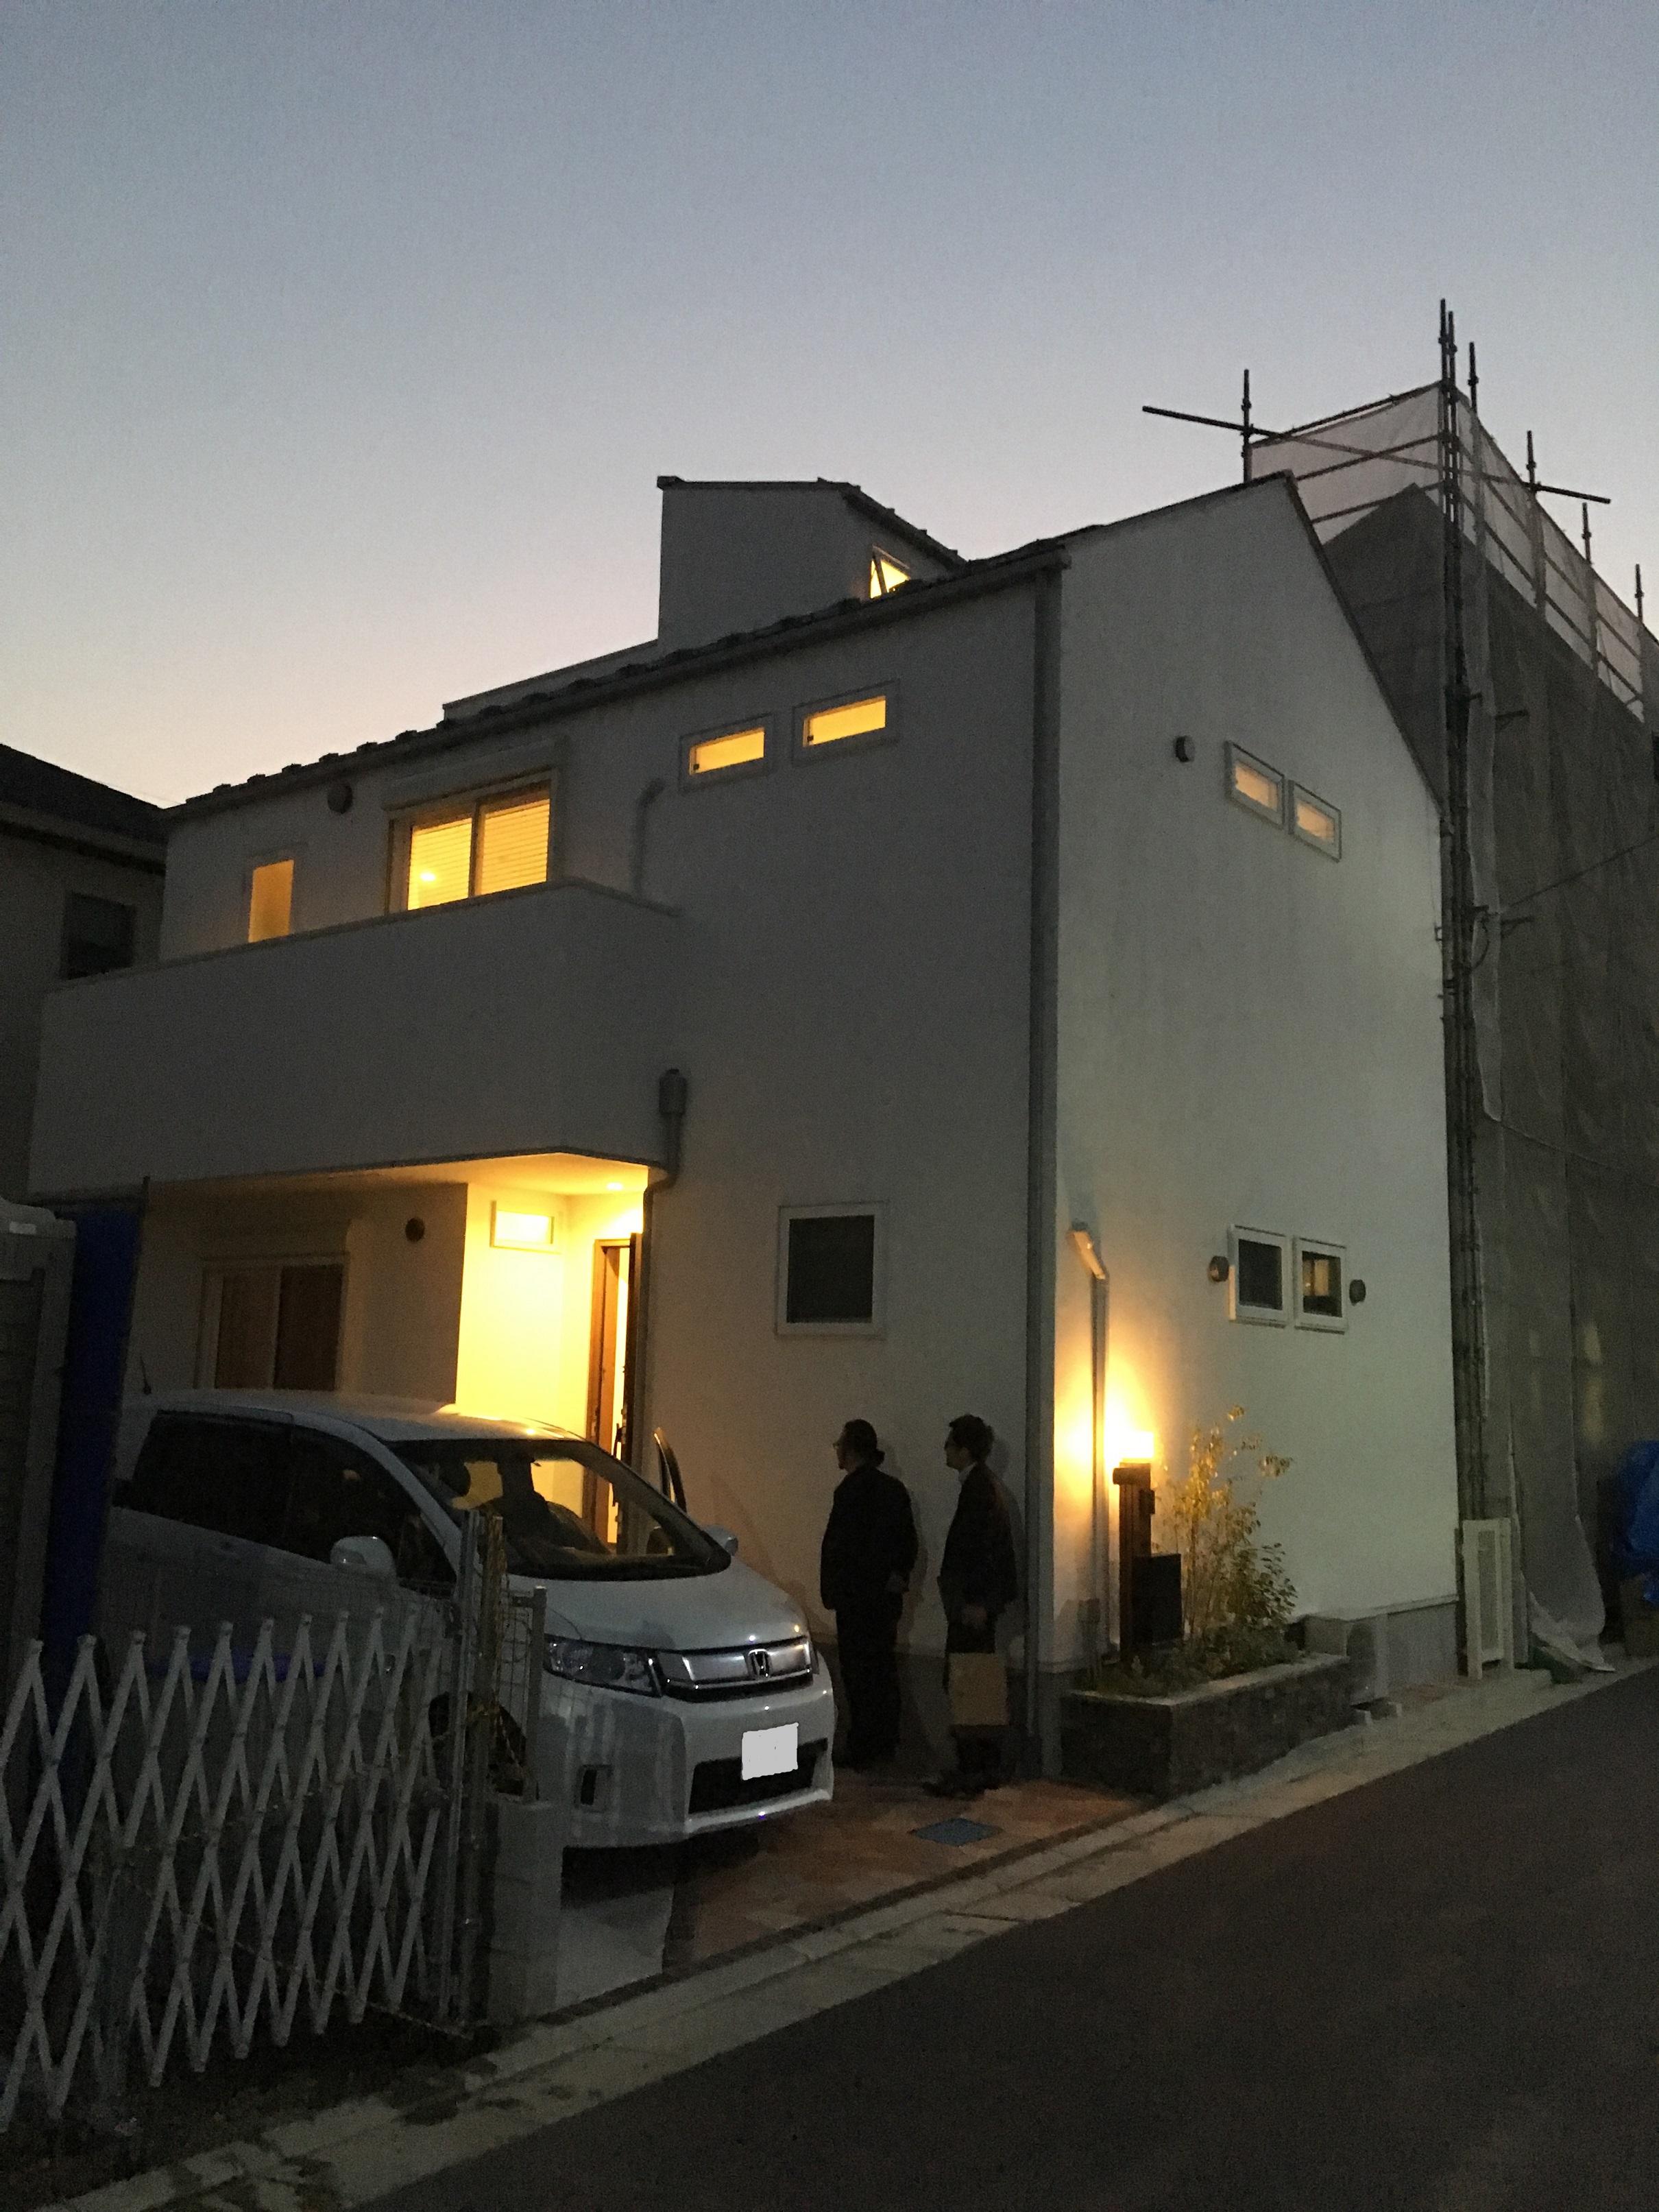 LOHASTA home(株式会社OKUTA LOHAS studio新宿店のブログ 石井 俊也@OKUTAのブログ) リフォームのオクタ